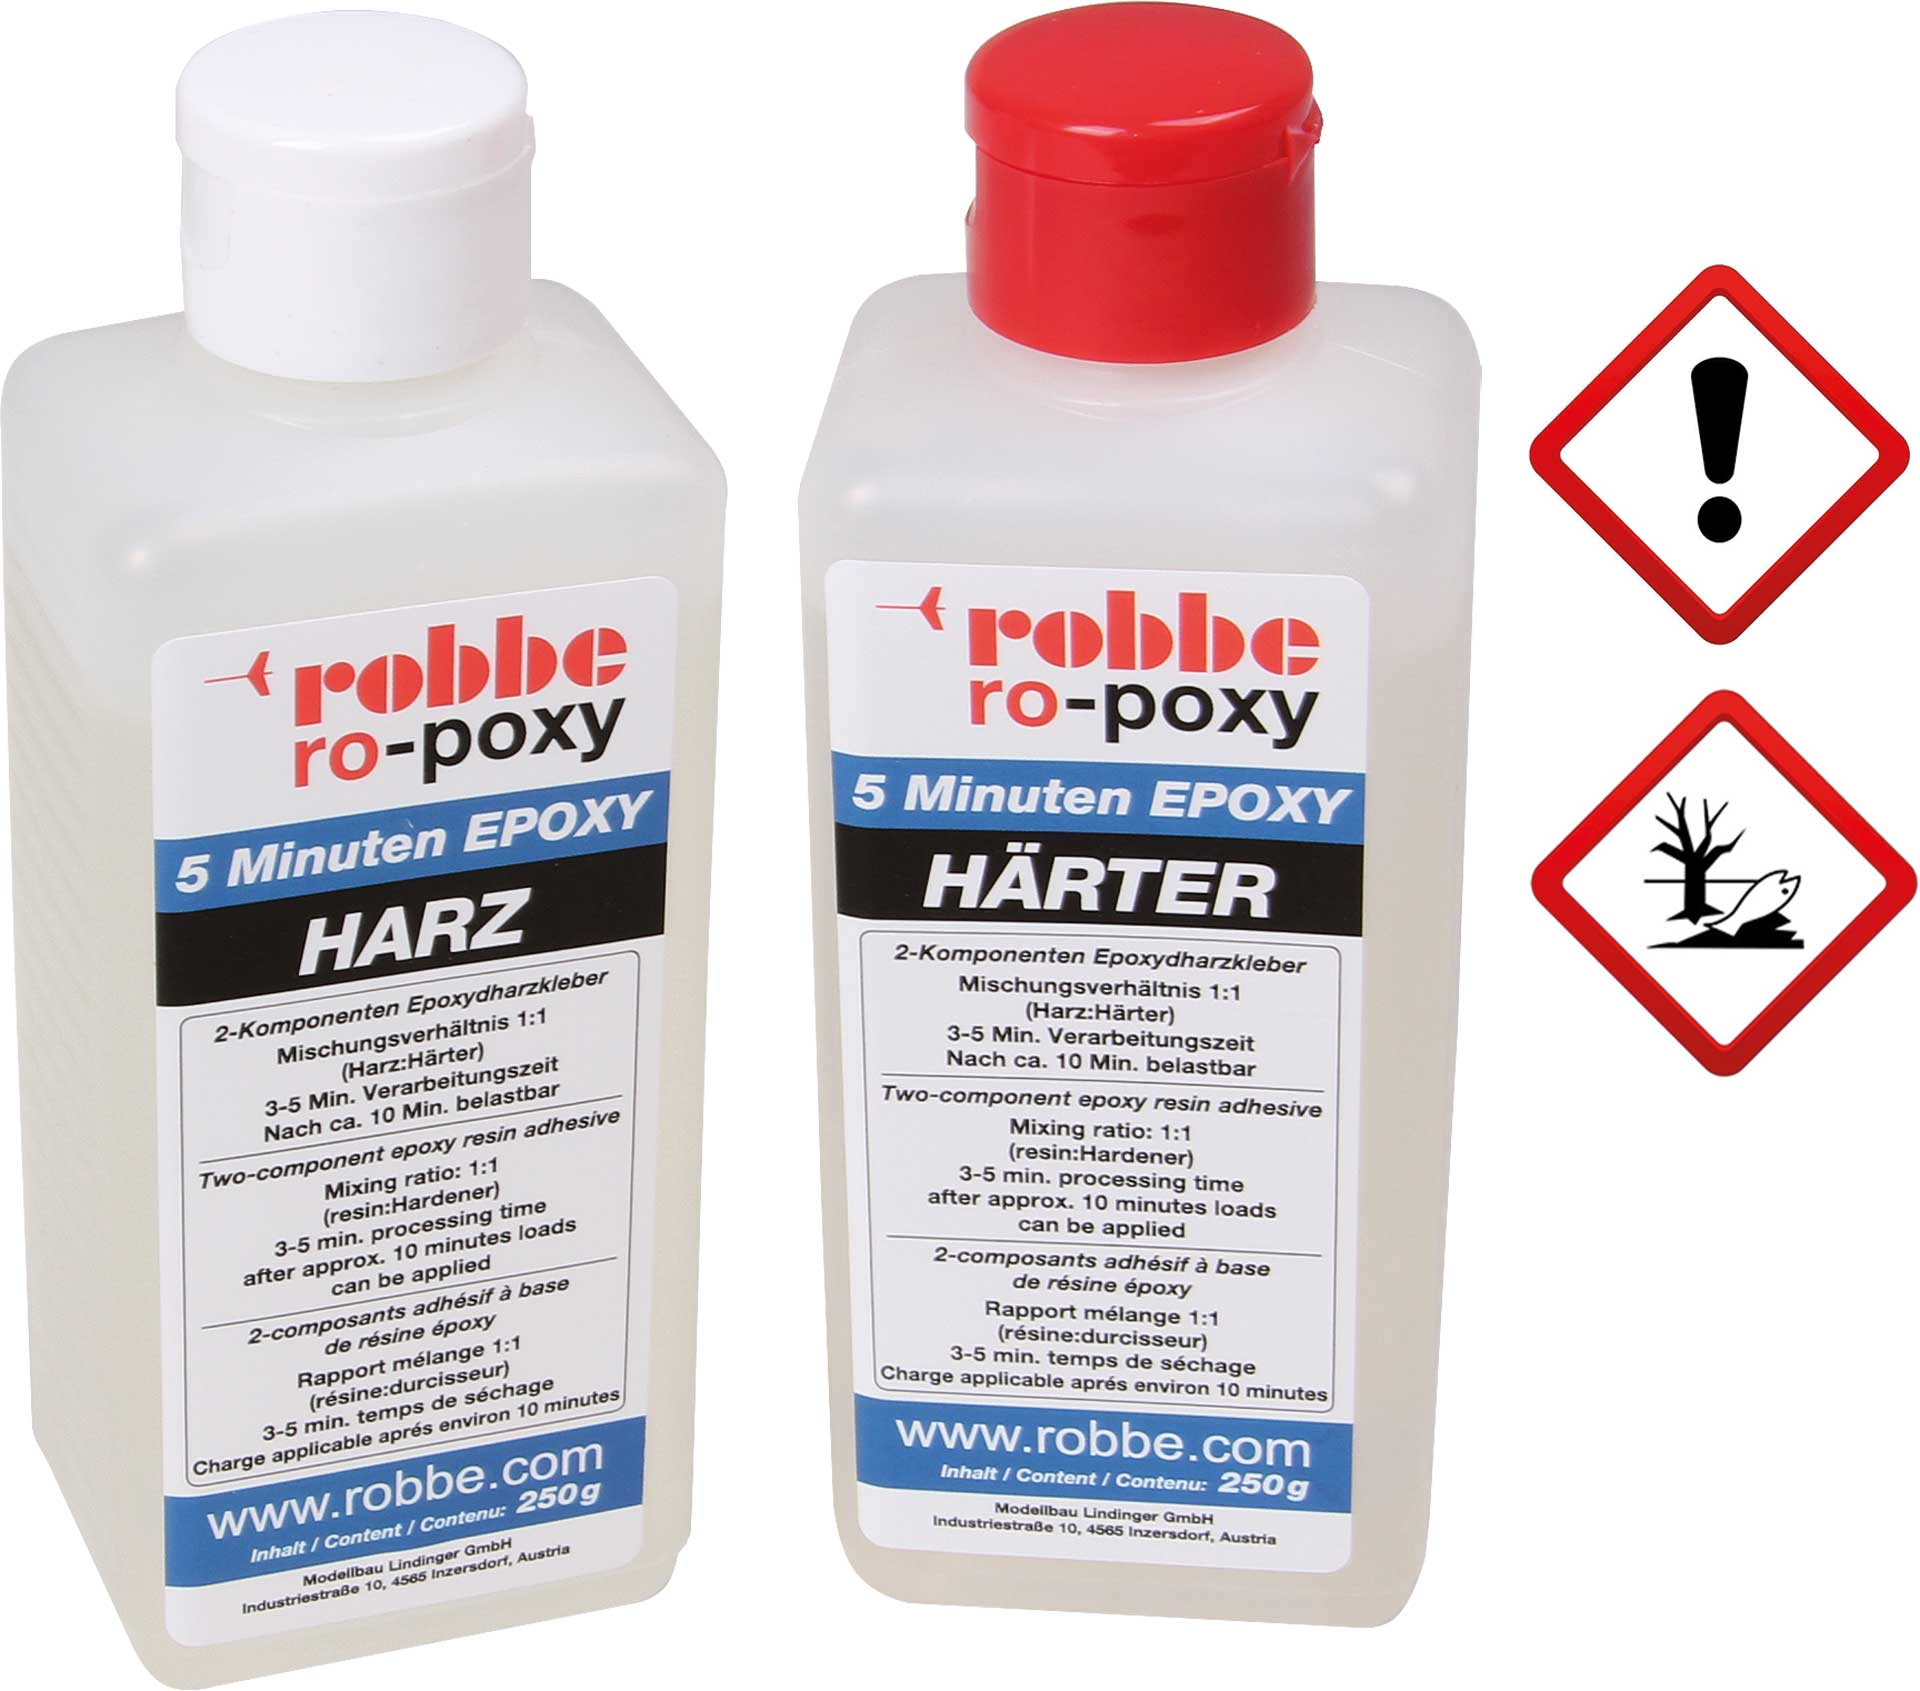 Robbe Modellsport RO-POXY 5 MINUTEN EPOXYDHARZKLEBER 500G JE 250G HARZ+HÄRTER